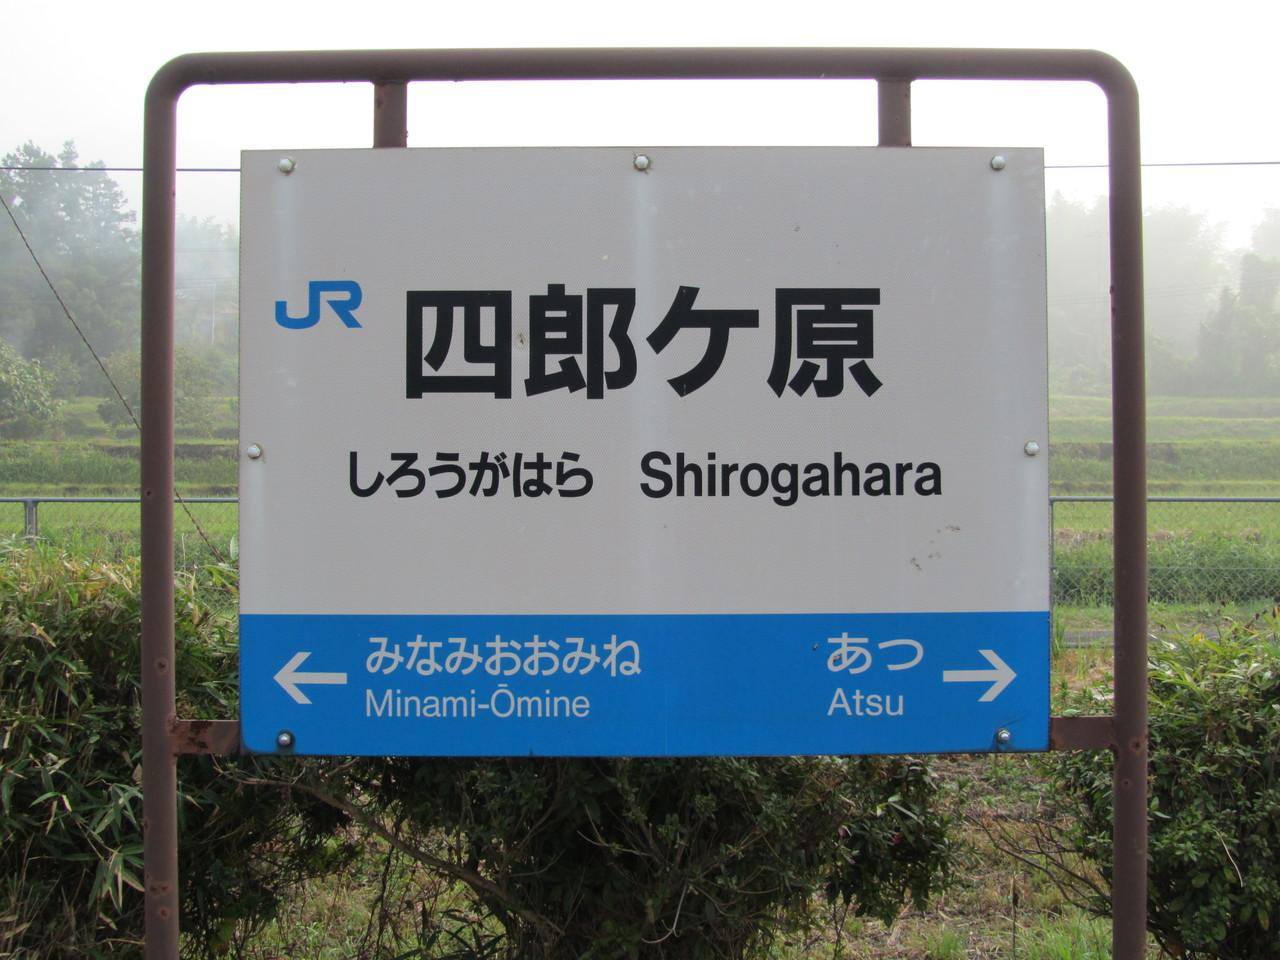 駅舎巡り、美祢線編 (10月10日...